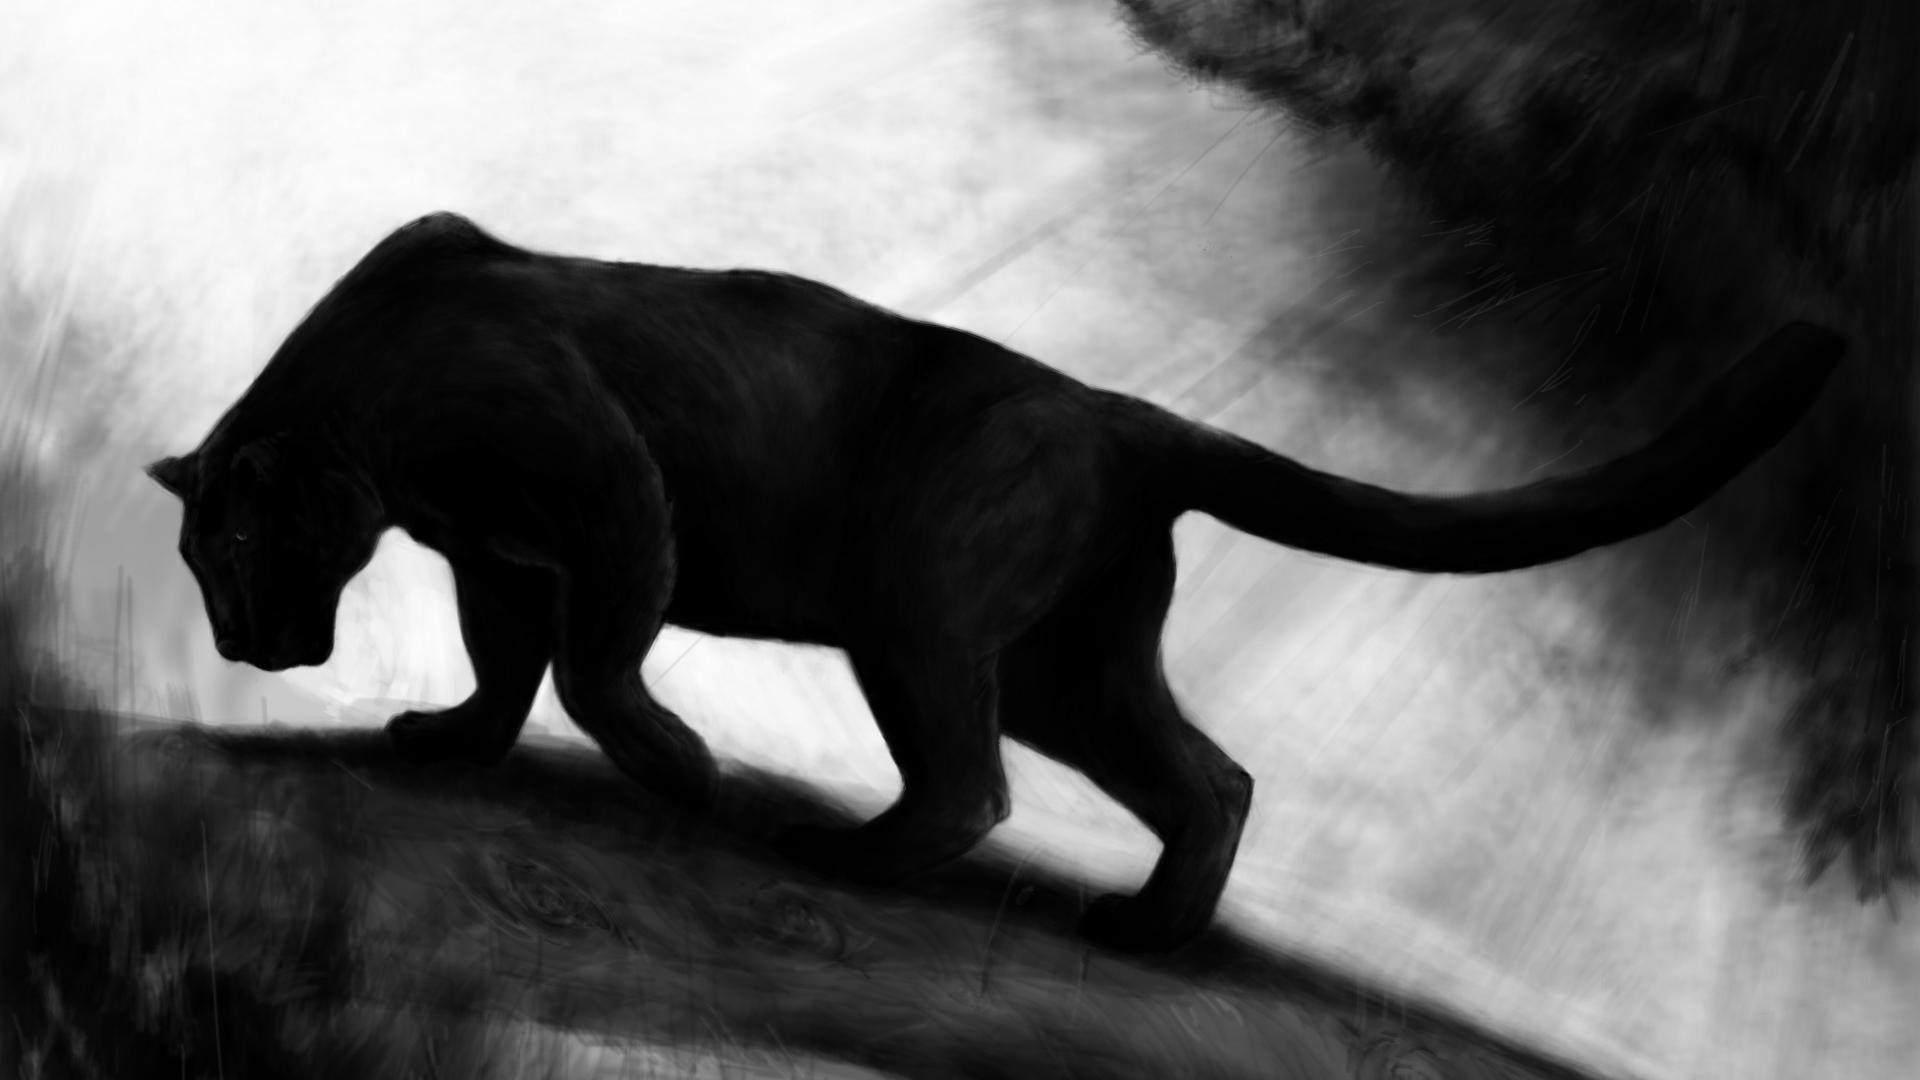 Black Tiger Hd Pics - Best Image of Tiger 2018